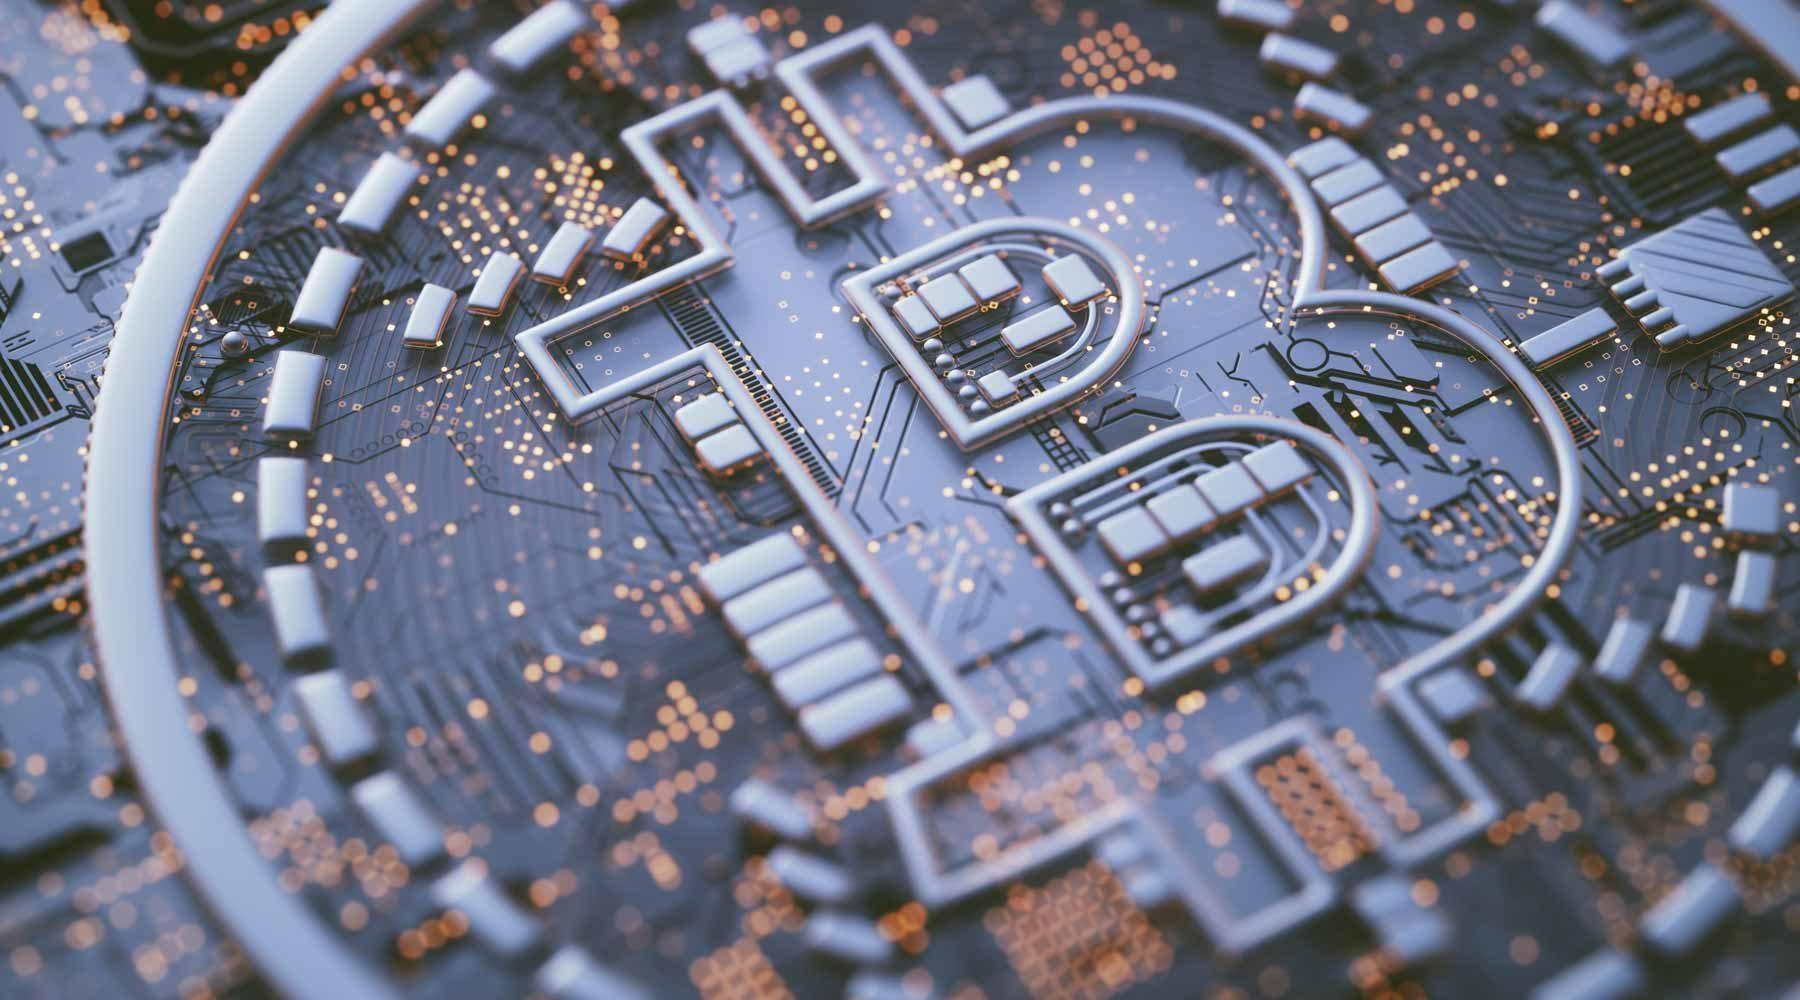 Bitcoin remains steady at $63,730 as Bitcoin stocks tumble